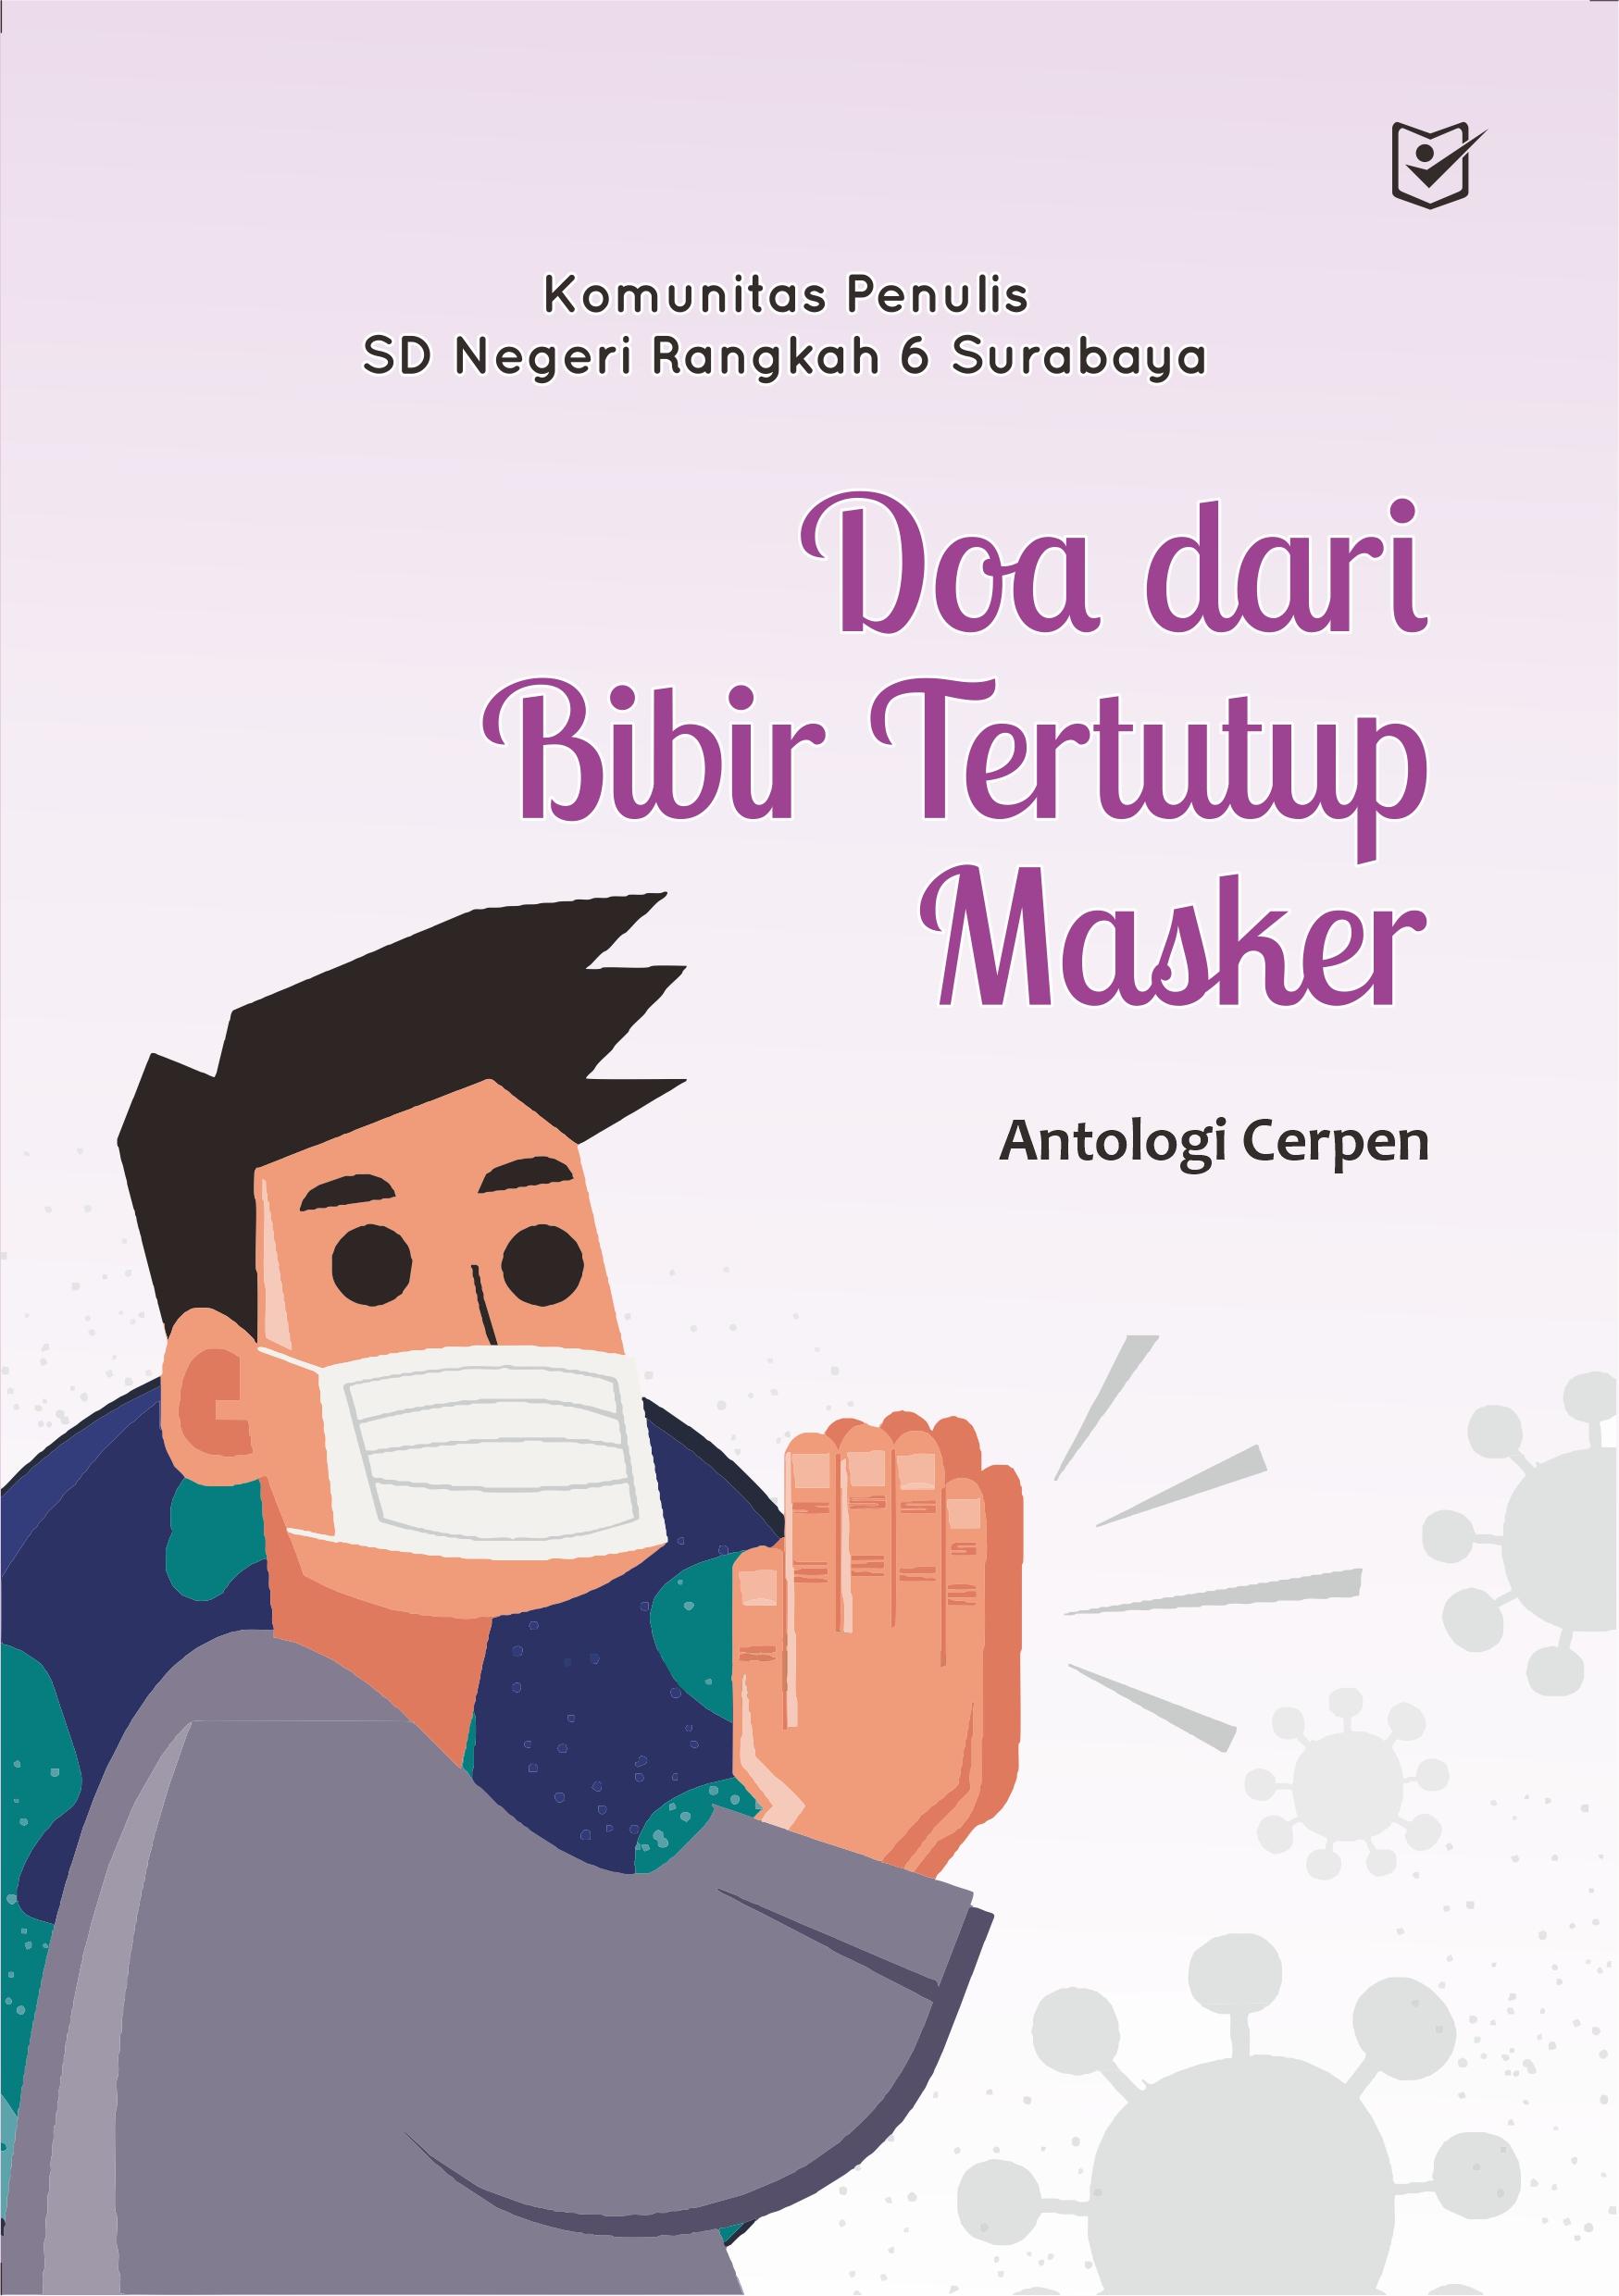 Doa dari bibir tertutup masker  [sumber elektronis] : antologi cerpen